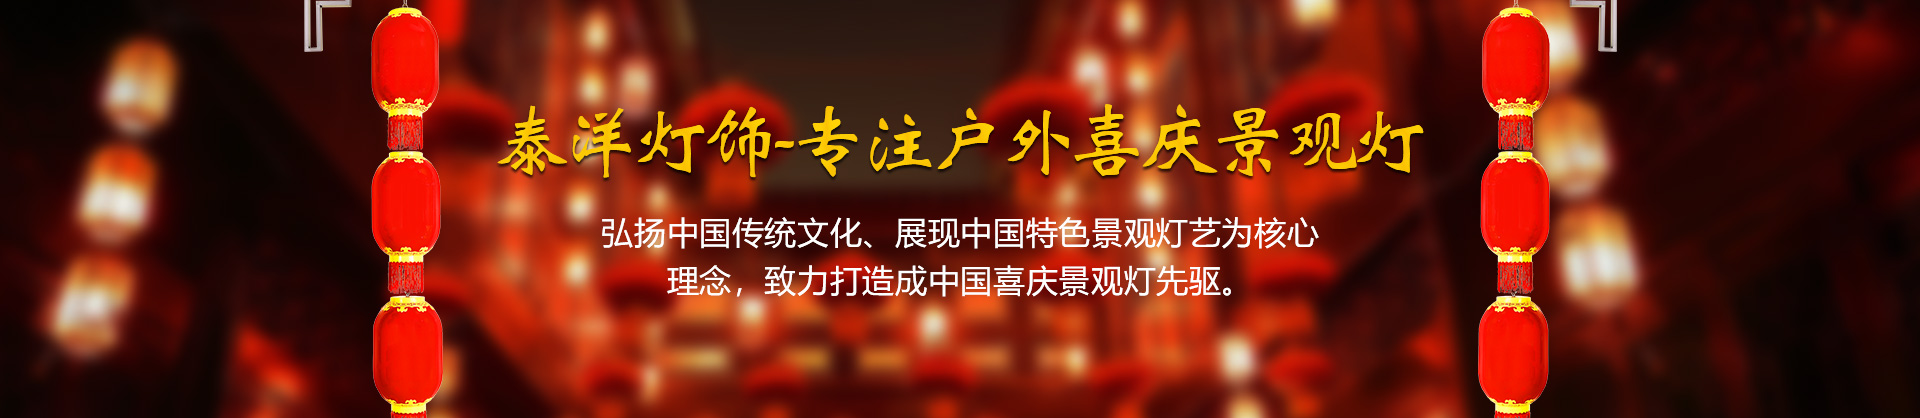 led中国结批发